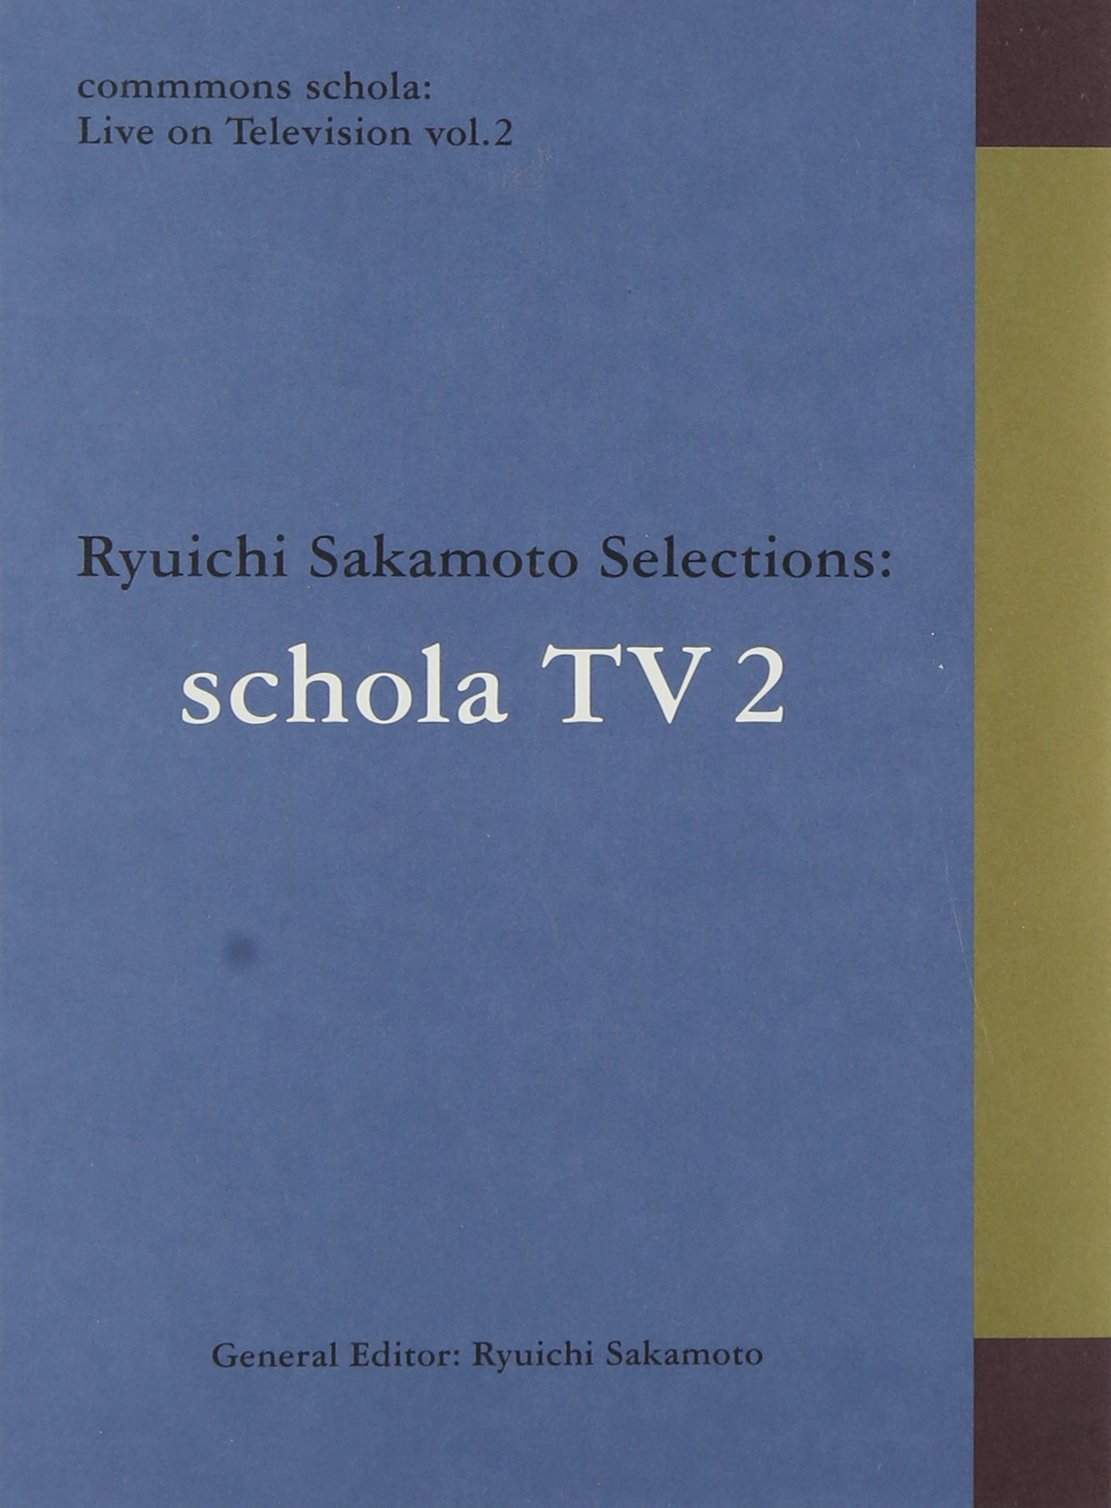 Ryuichi Sakamoto - Commmons Schola: Live On Television Vol.2 Ryuichi Sakamoto Selections: Schola TV [Japan BD] RZXM-59557 by